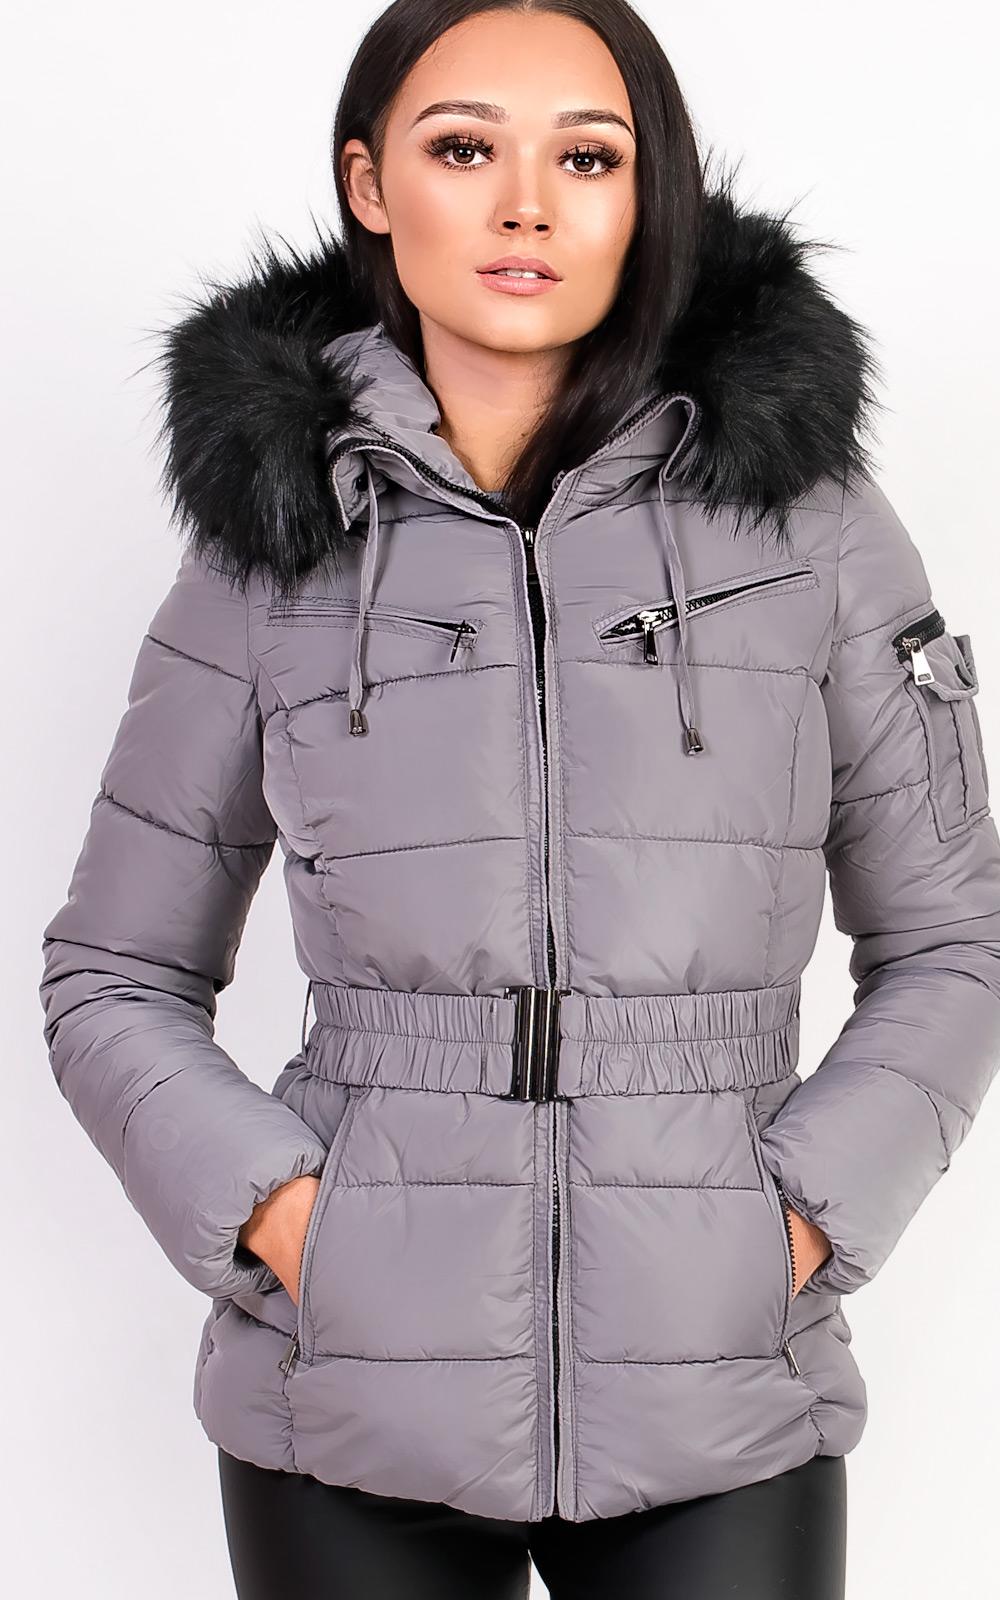 6c9a1cd01f257 IKRUSH Womens Hadid Padded Faux Fur Hooded Jacket GREY UK XL ...